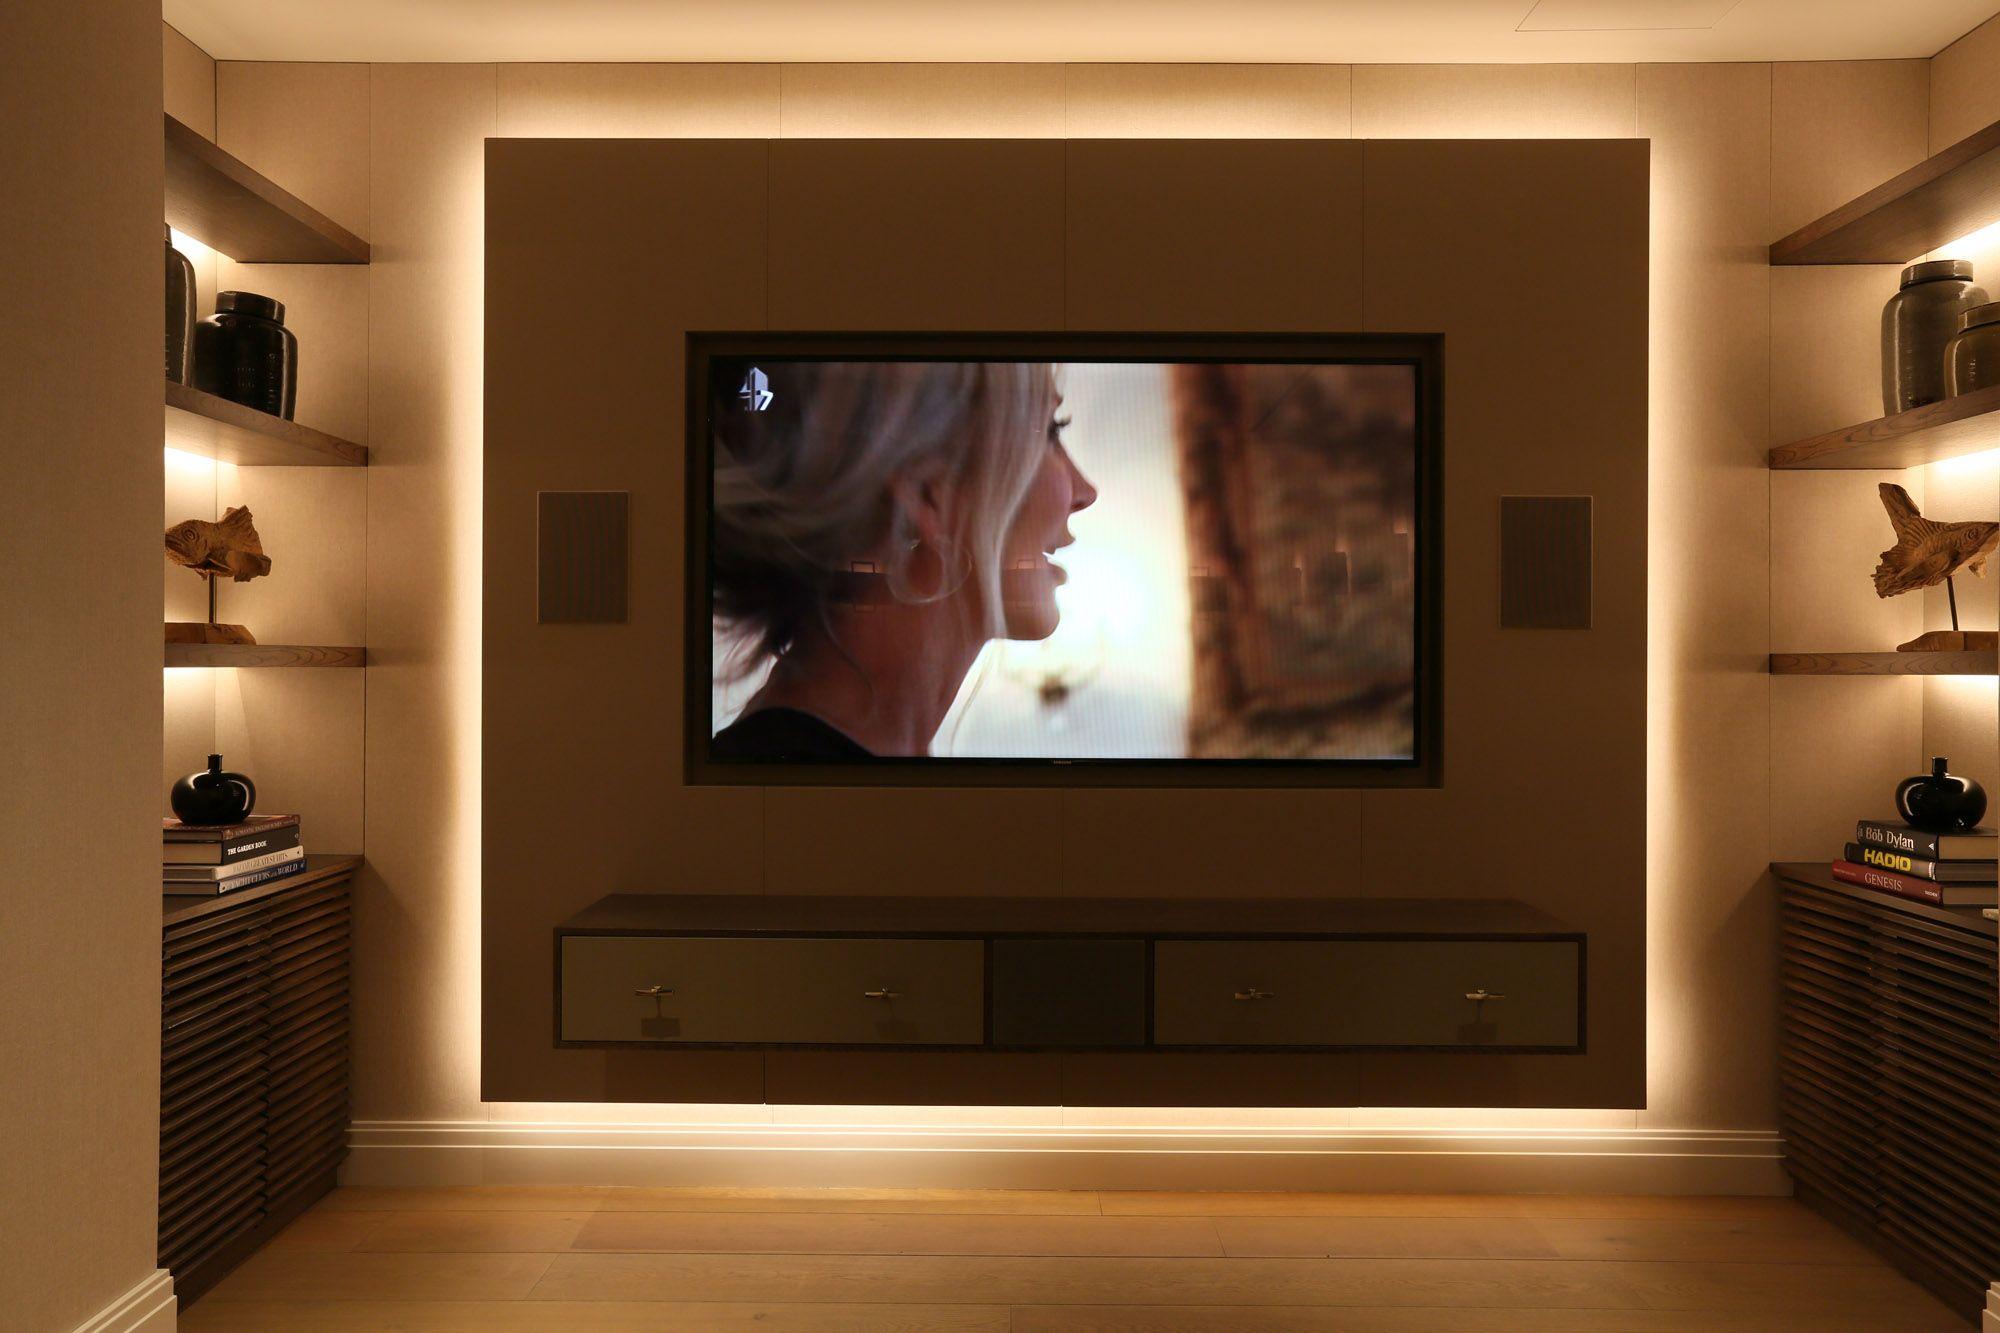 cinema and games room lighting design